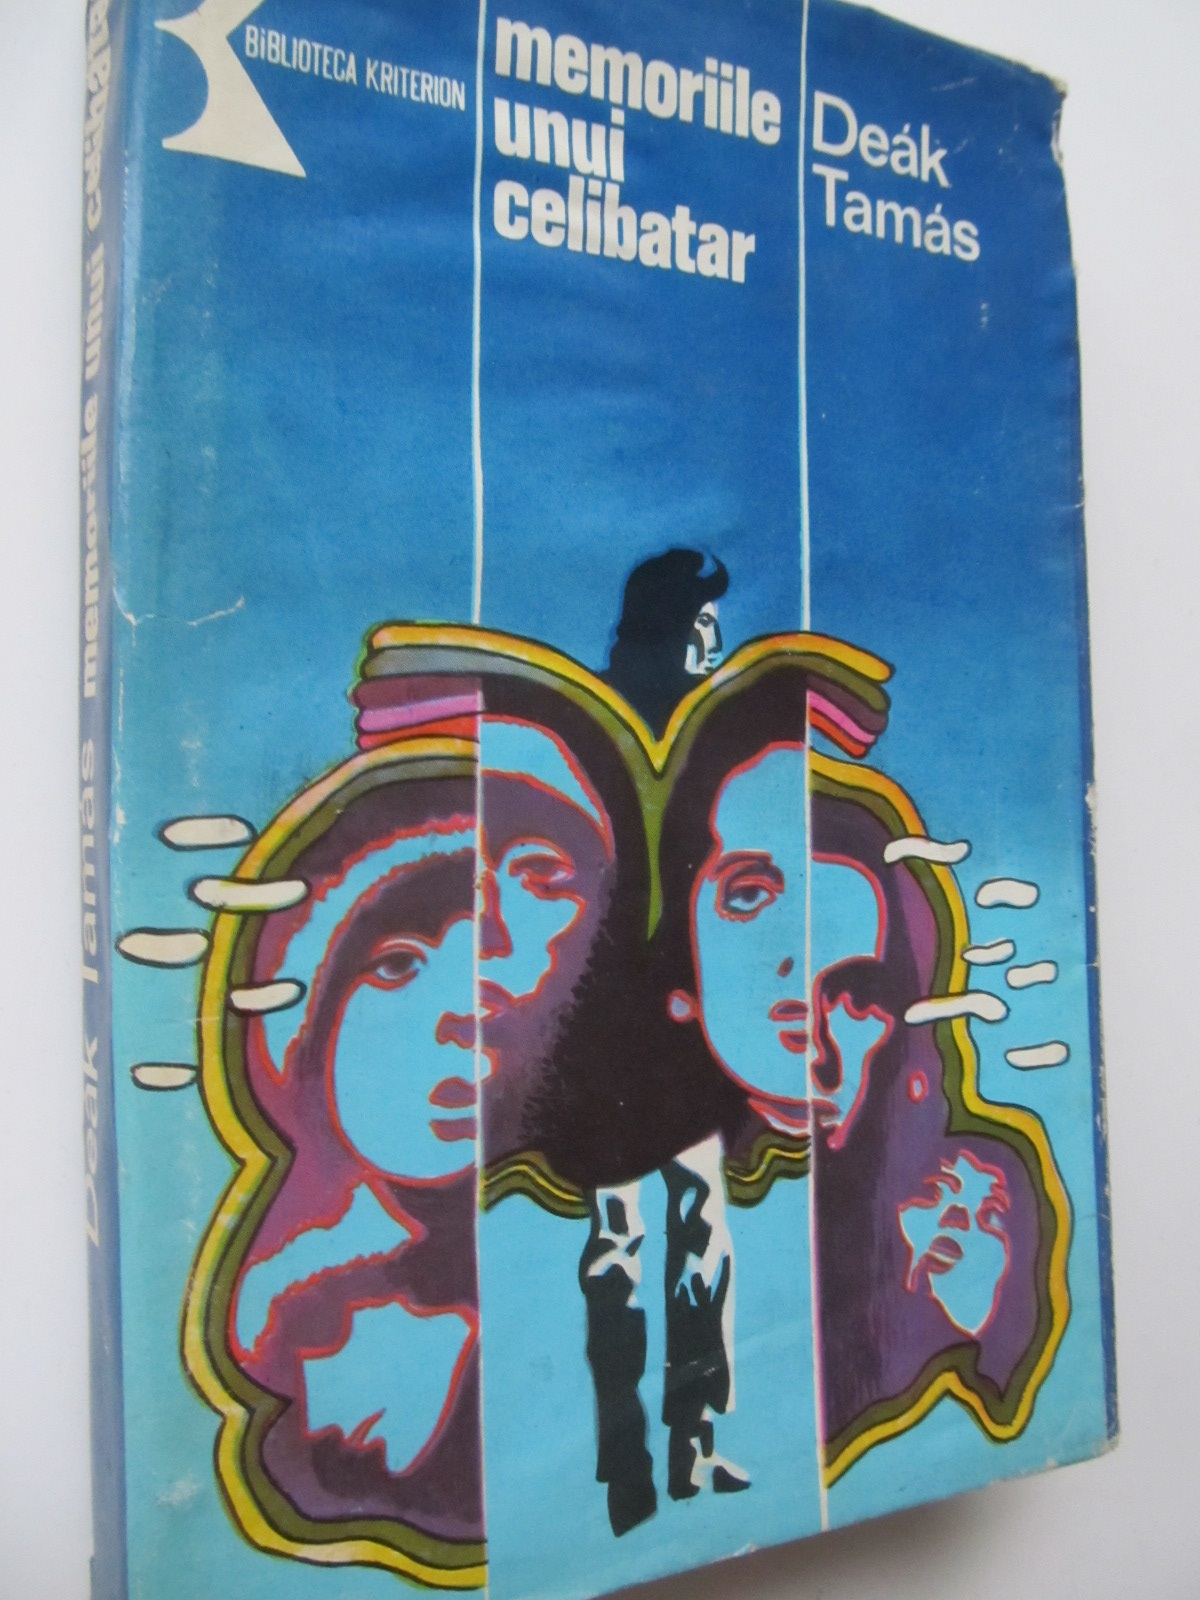 Carte Memoriile unui celibatar - Deak Tamas